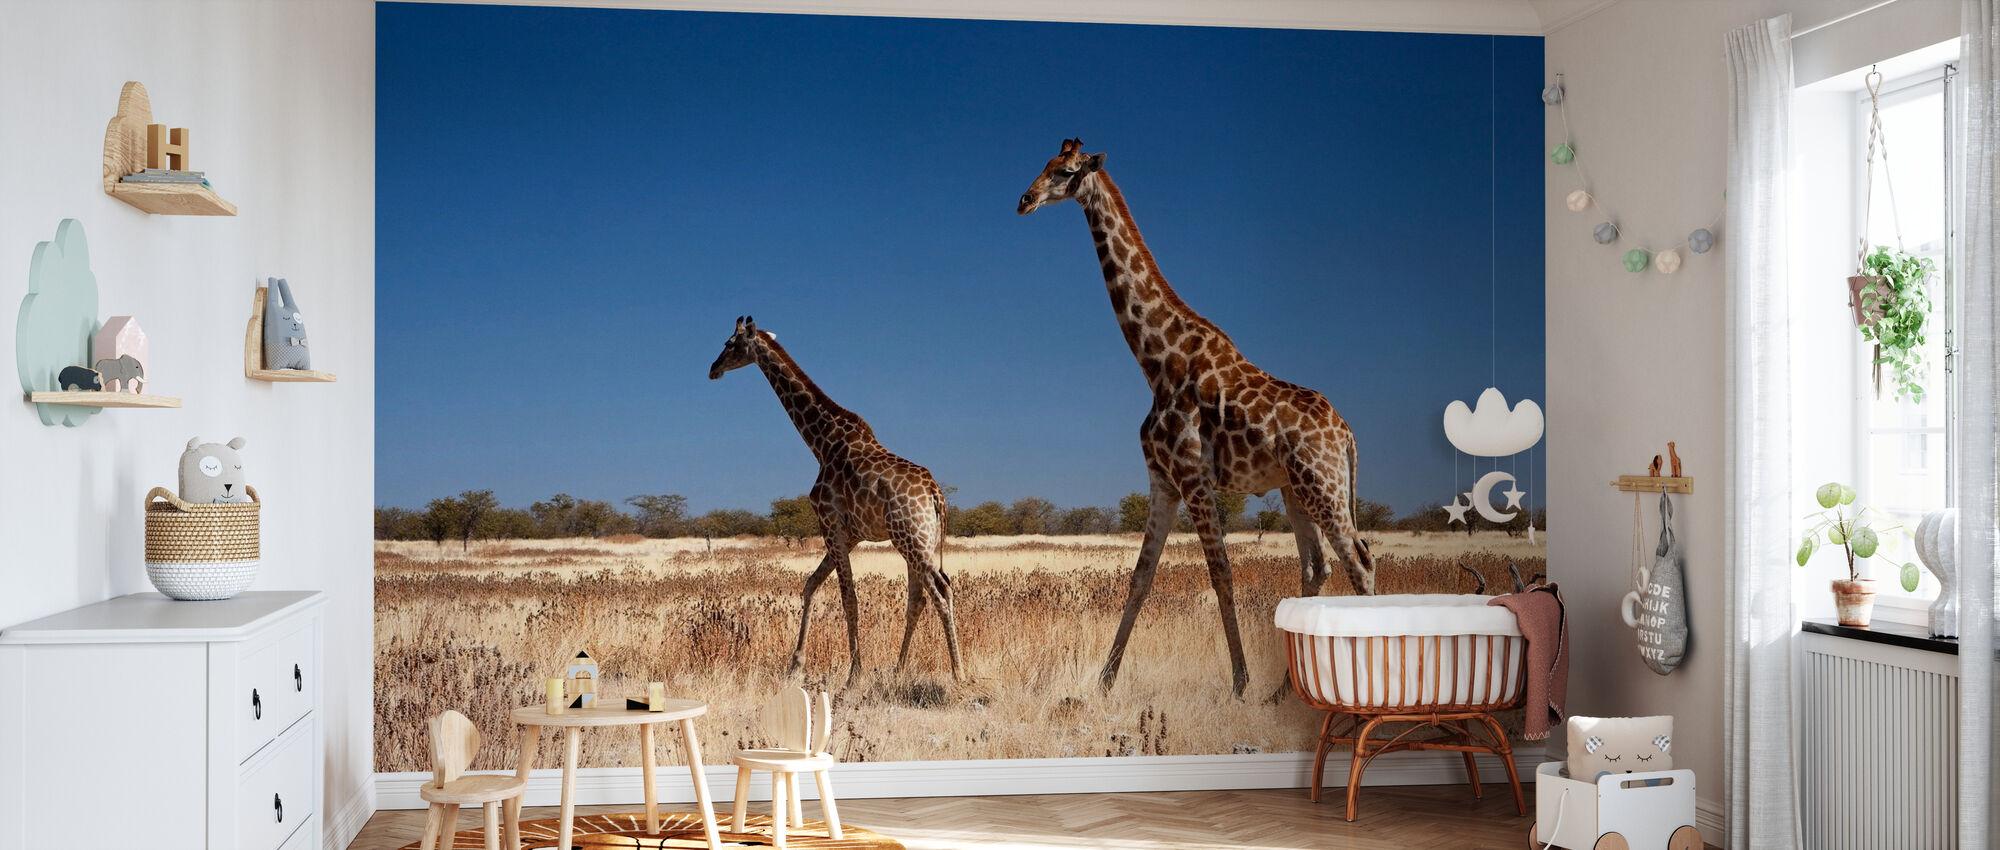 Giraffes at Etosha National Park - Wallpaper - Nursery